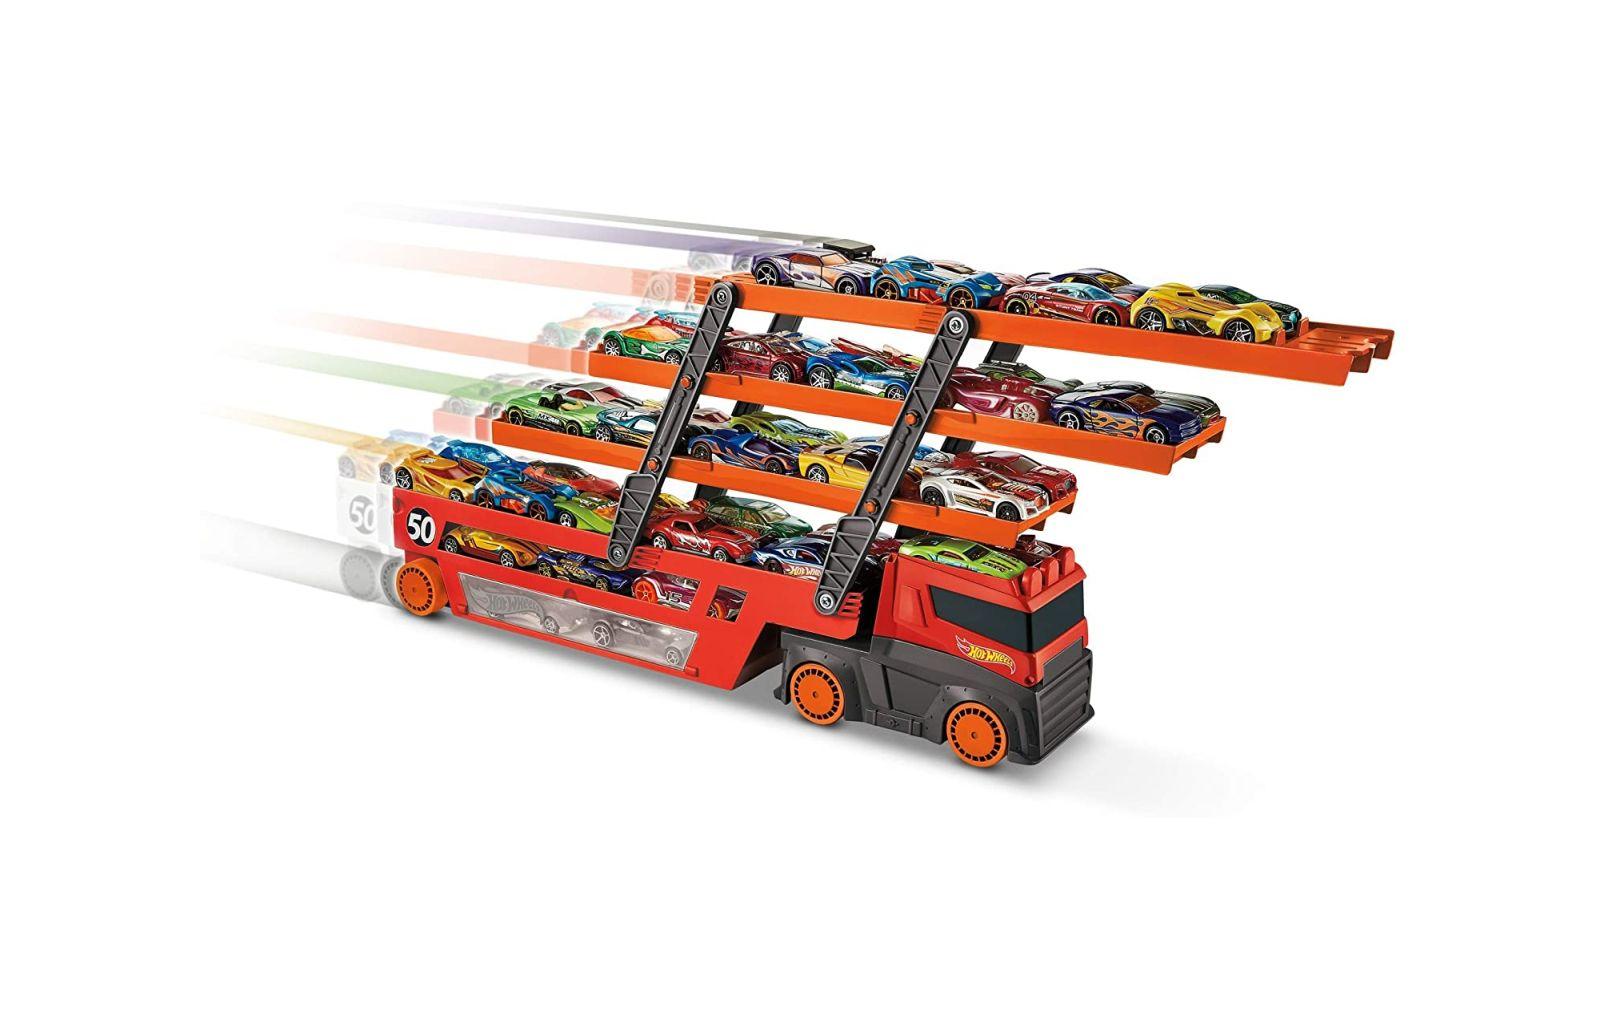 Hot wheels mega trasportatore, camion per veicoli - Hot Wheels